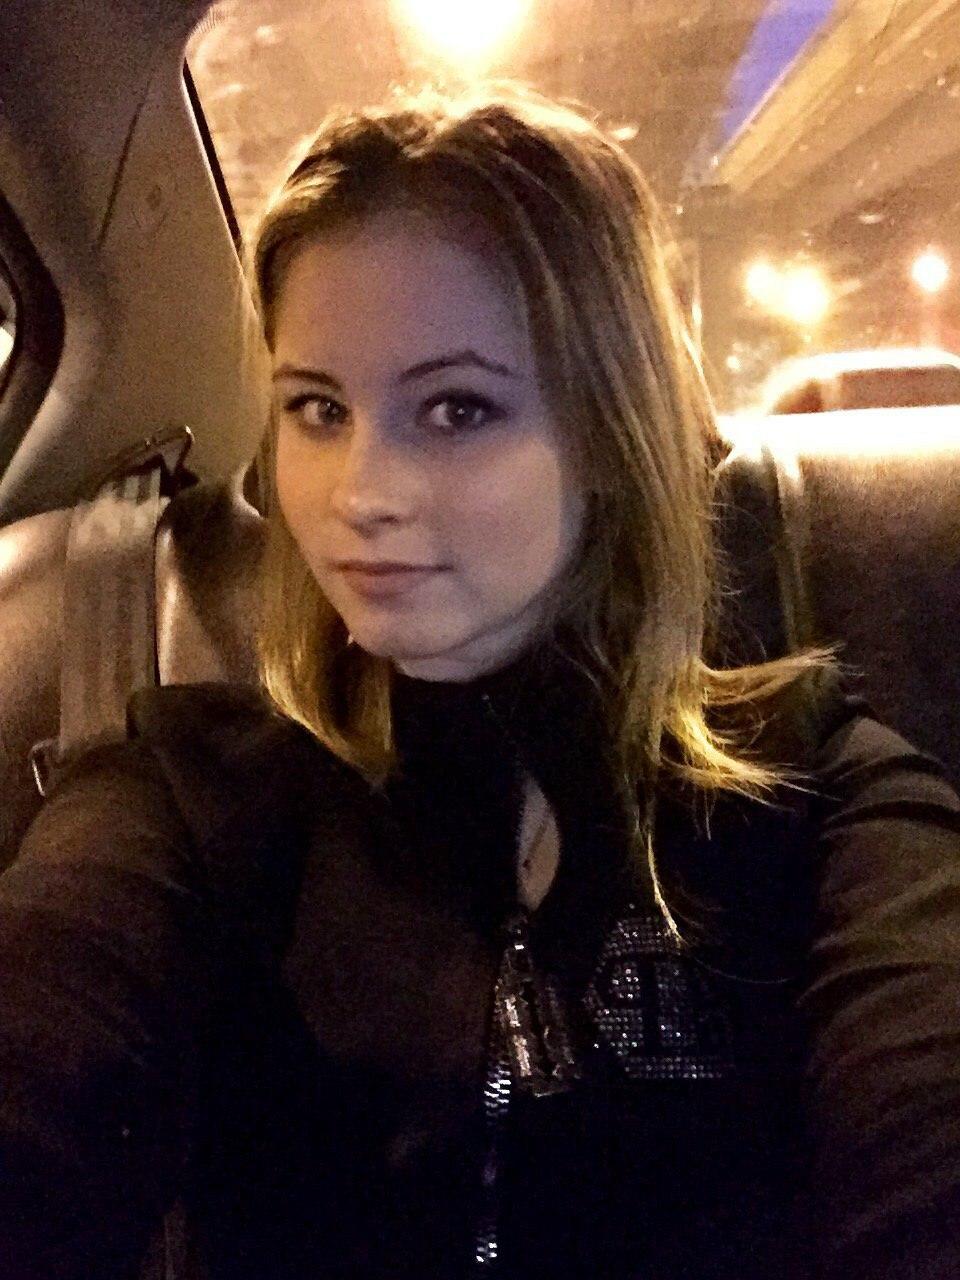 Юлия Липницкая - 2 - Страница 5 GJUoFsimIs4